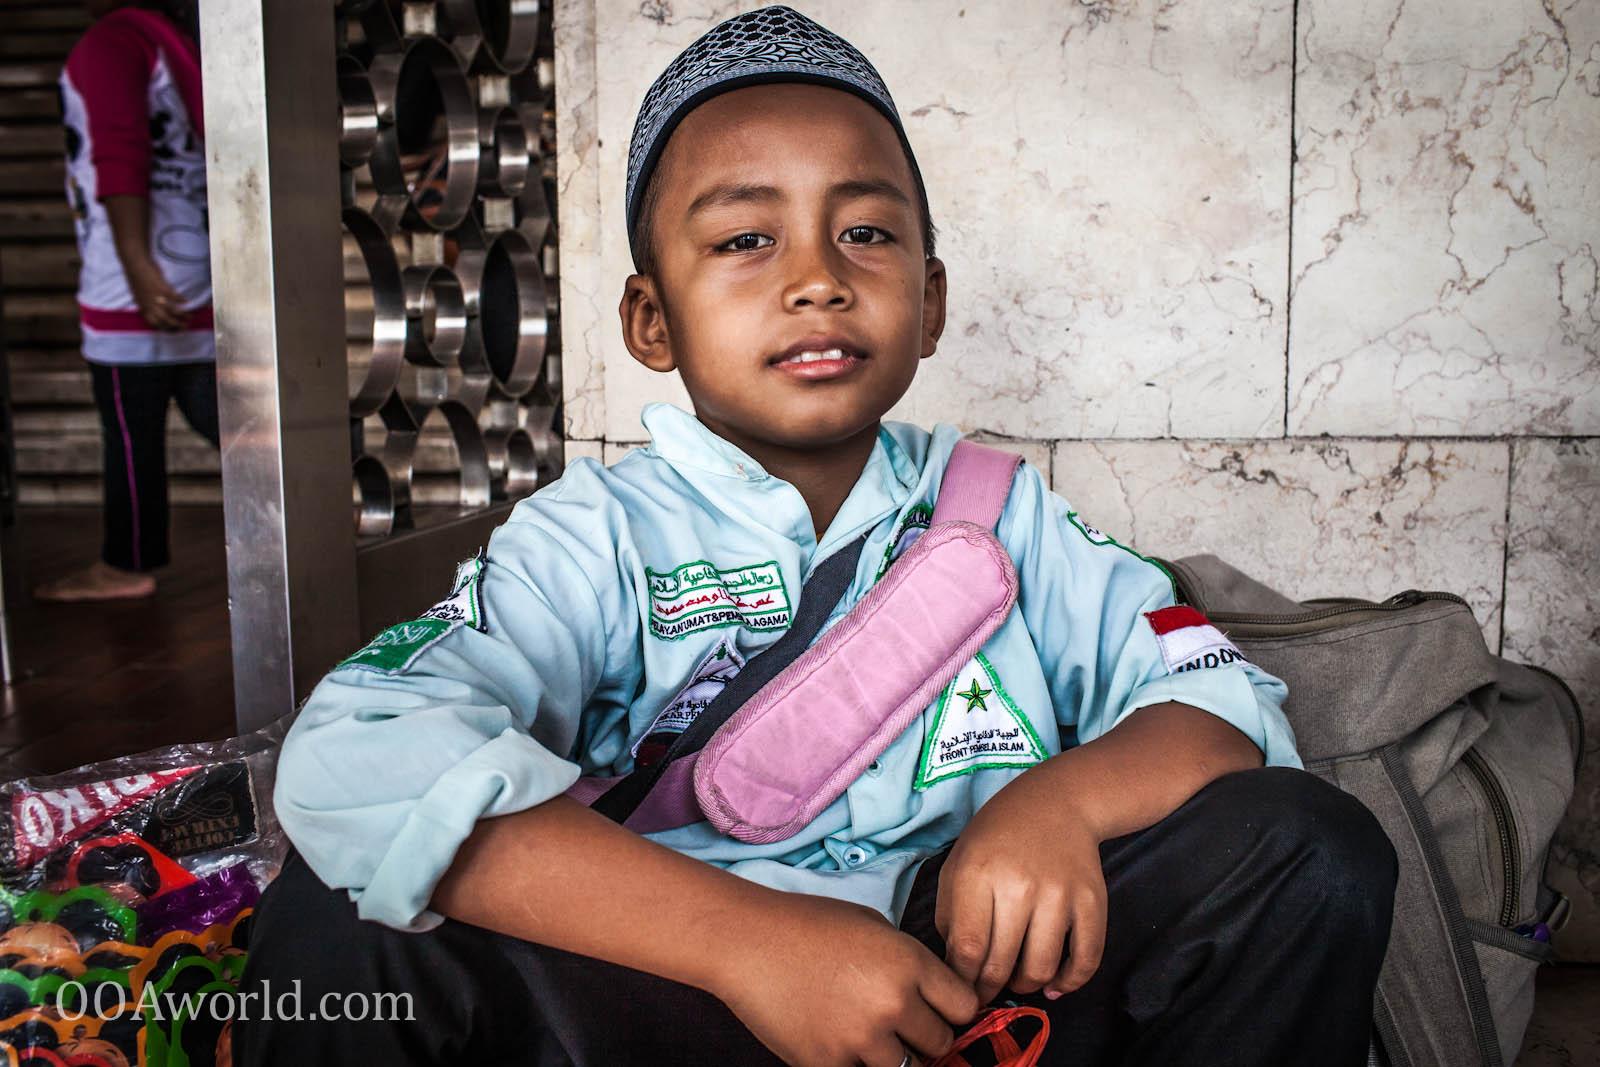 Masjid Istiqlal Mosque Boy Portrait Photo Ooaworld